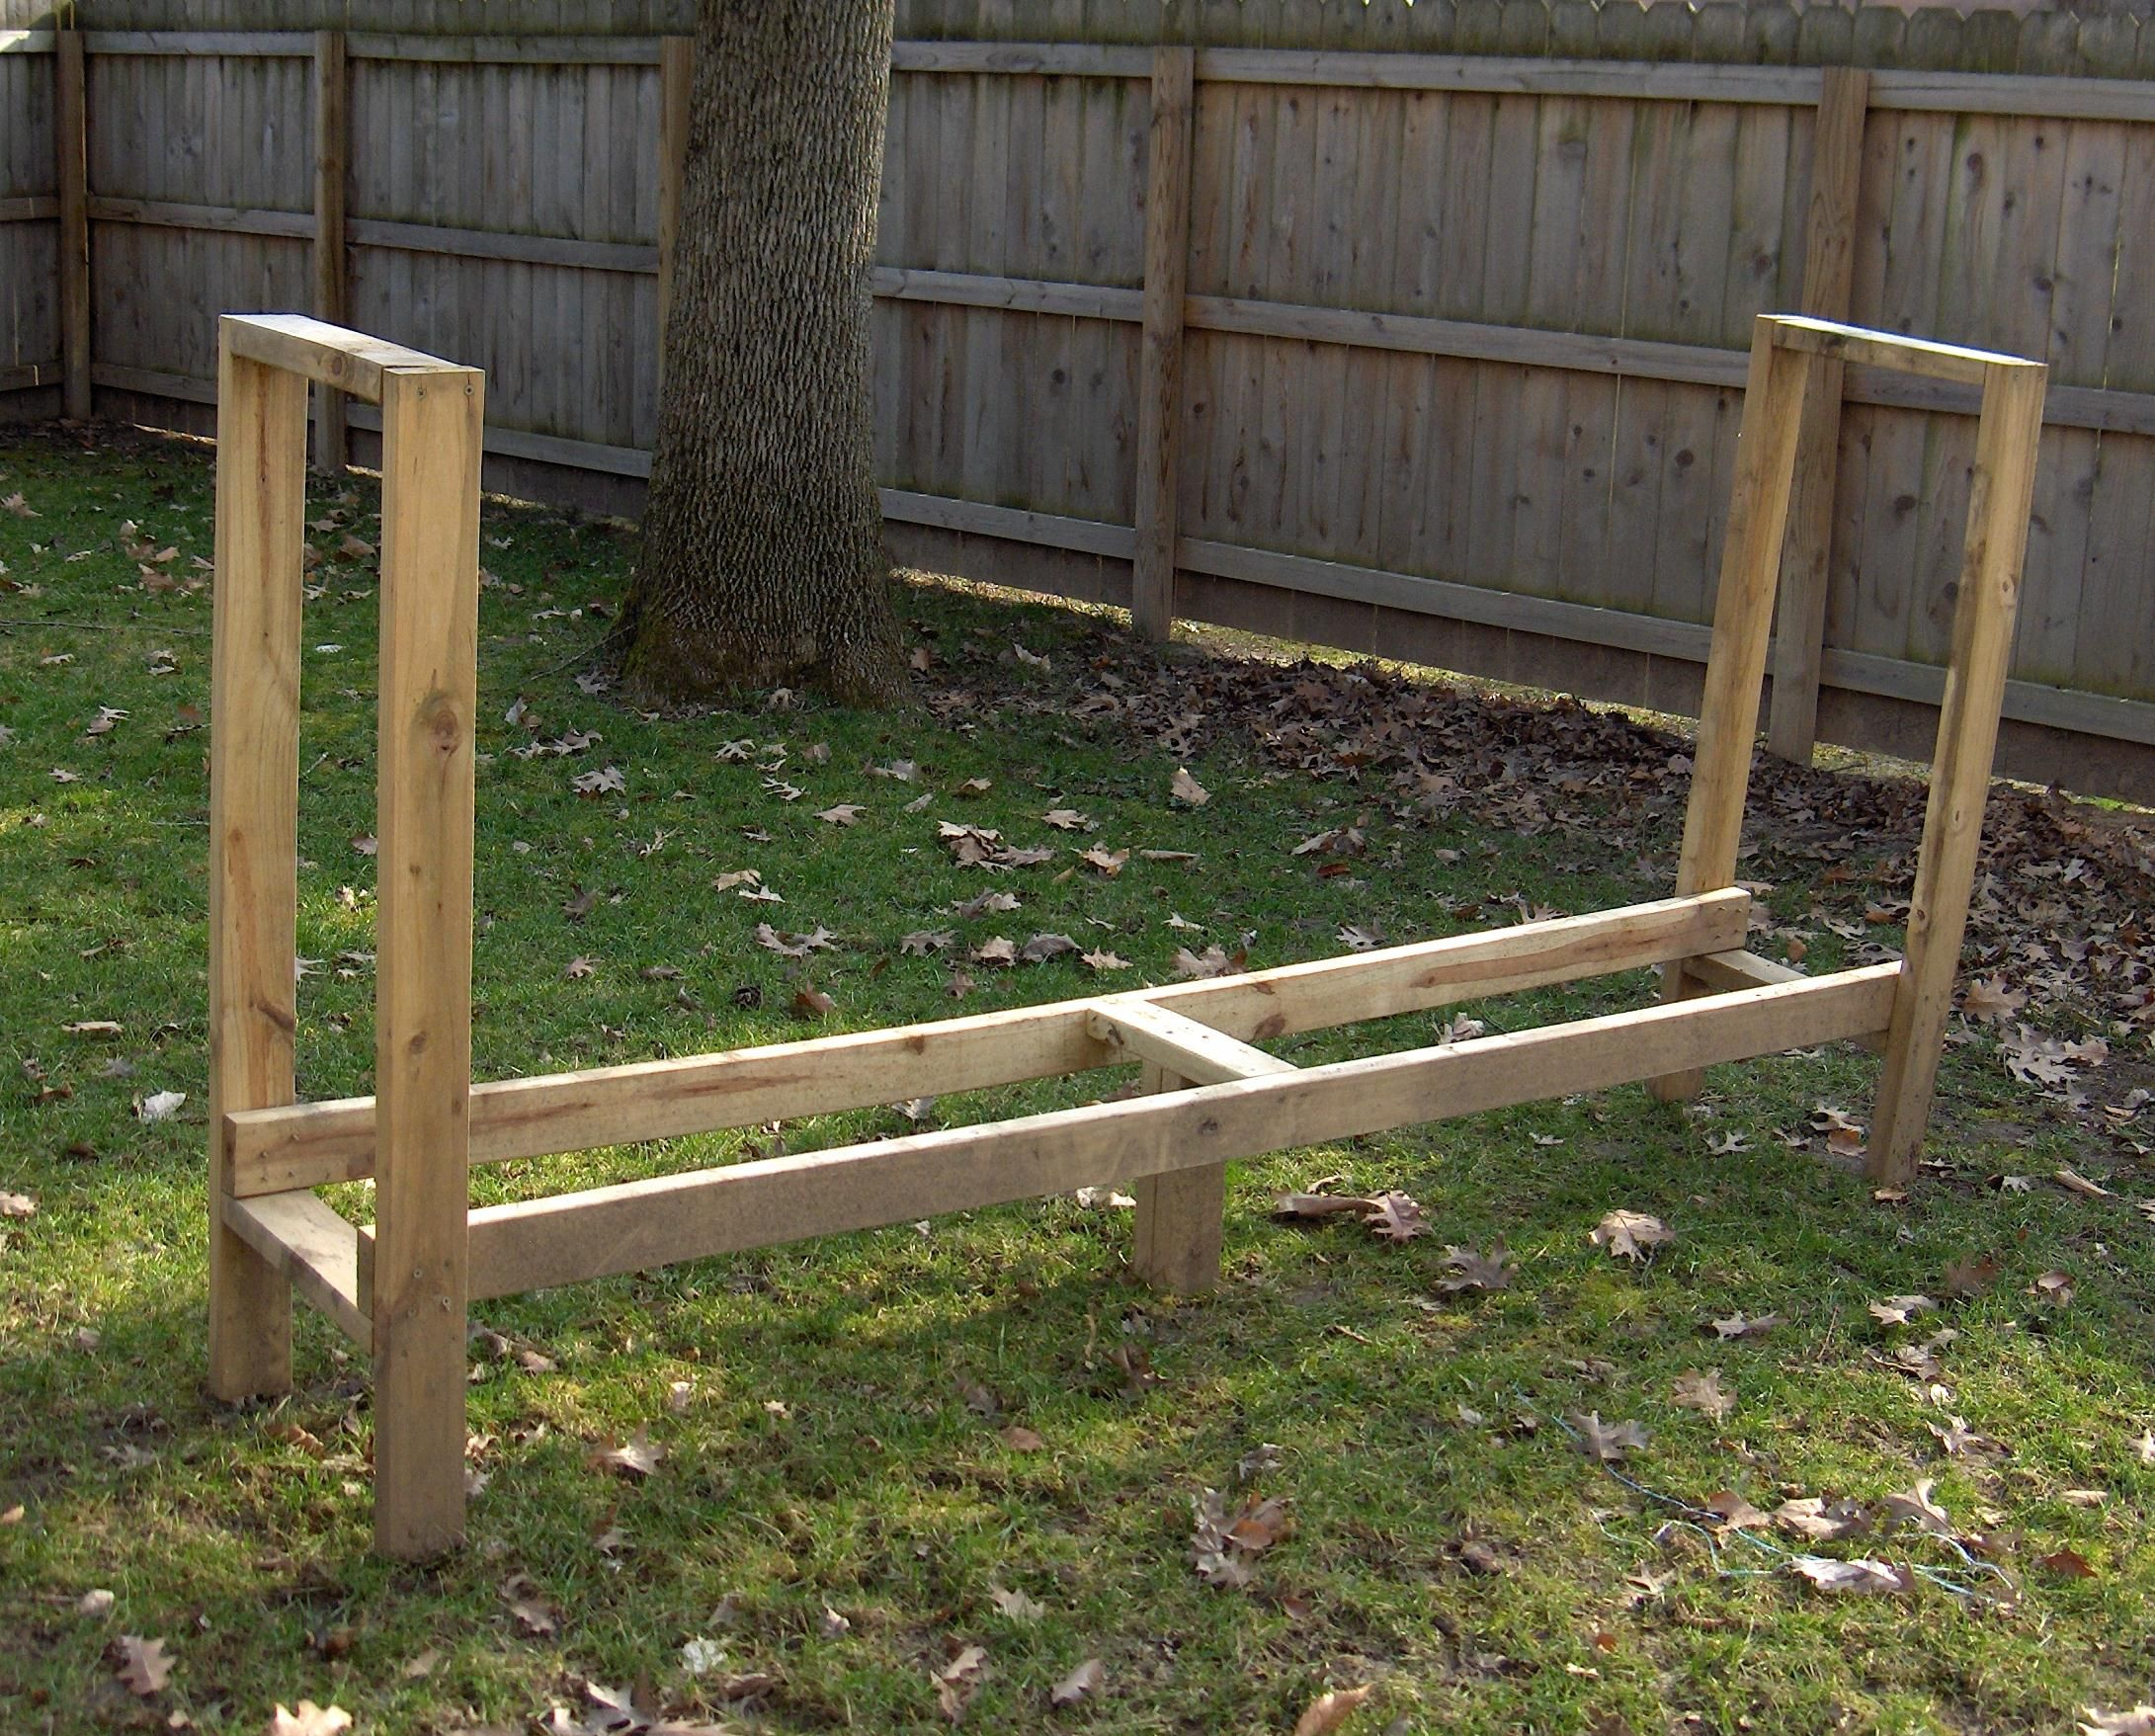 Diy wooden firewood rack plans pdf download stanley plane